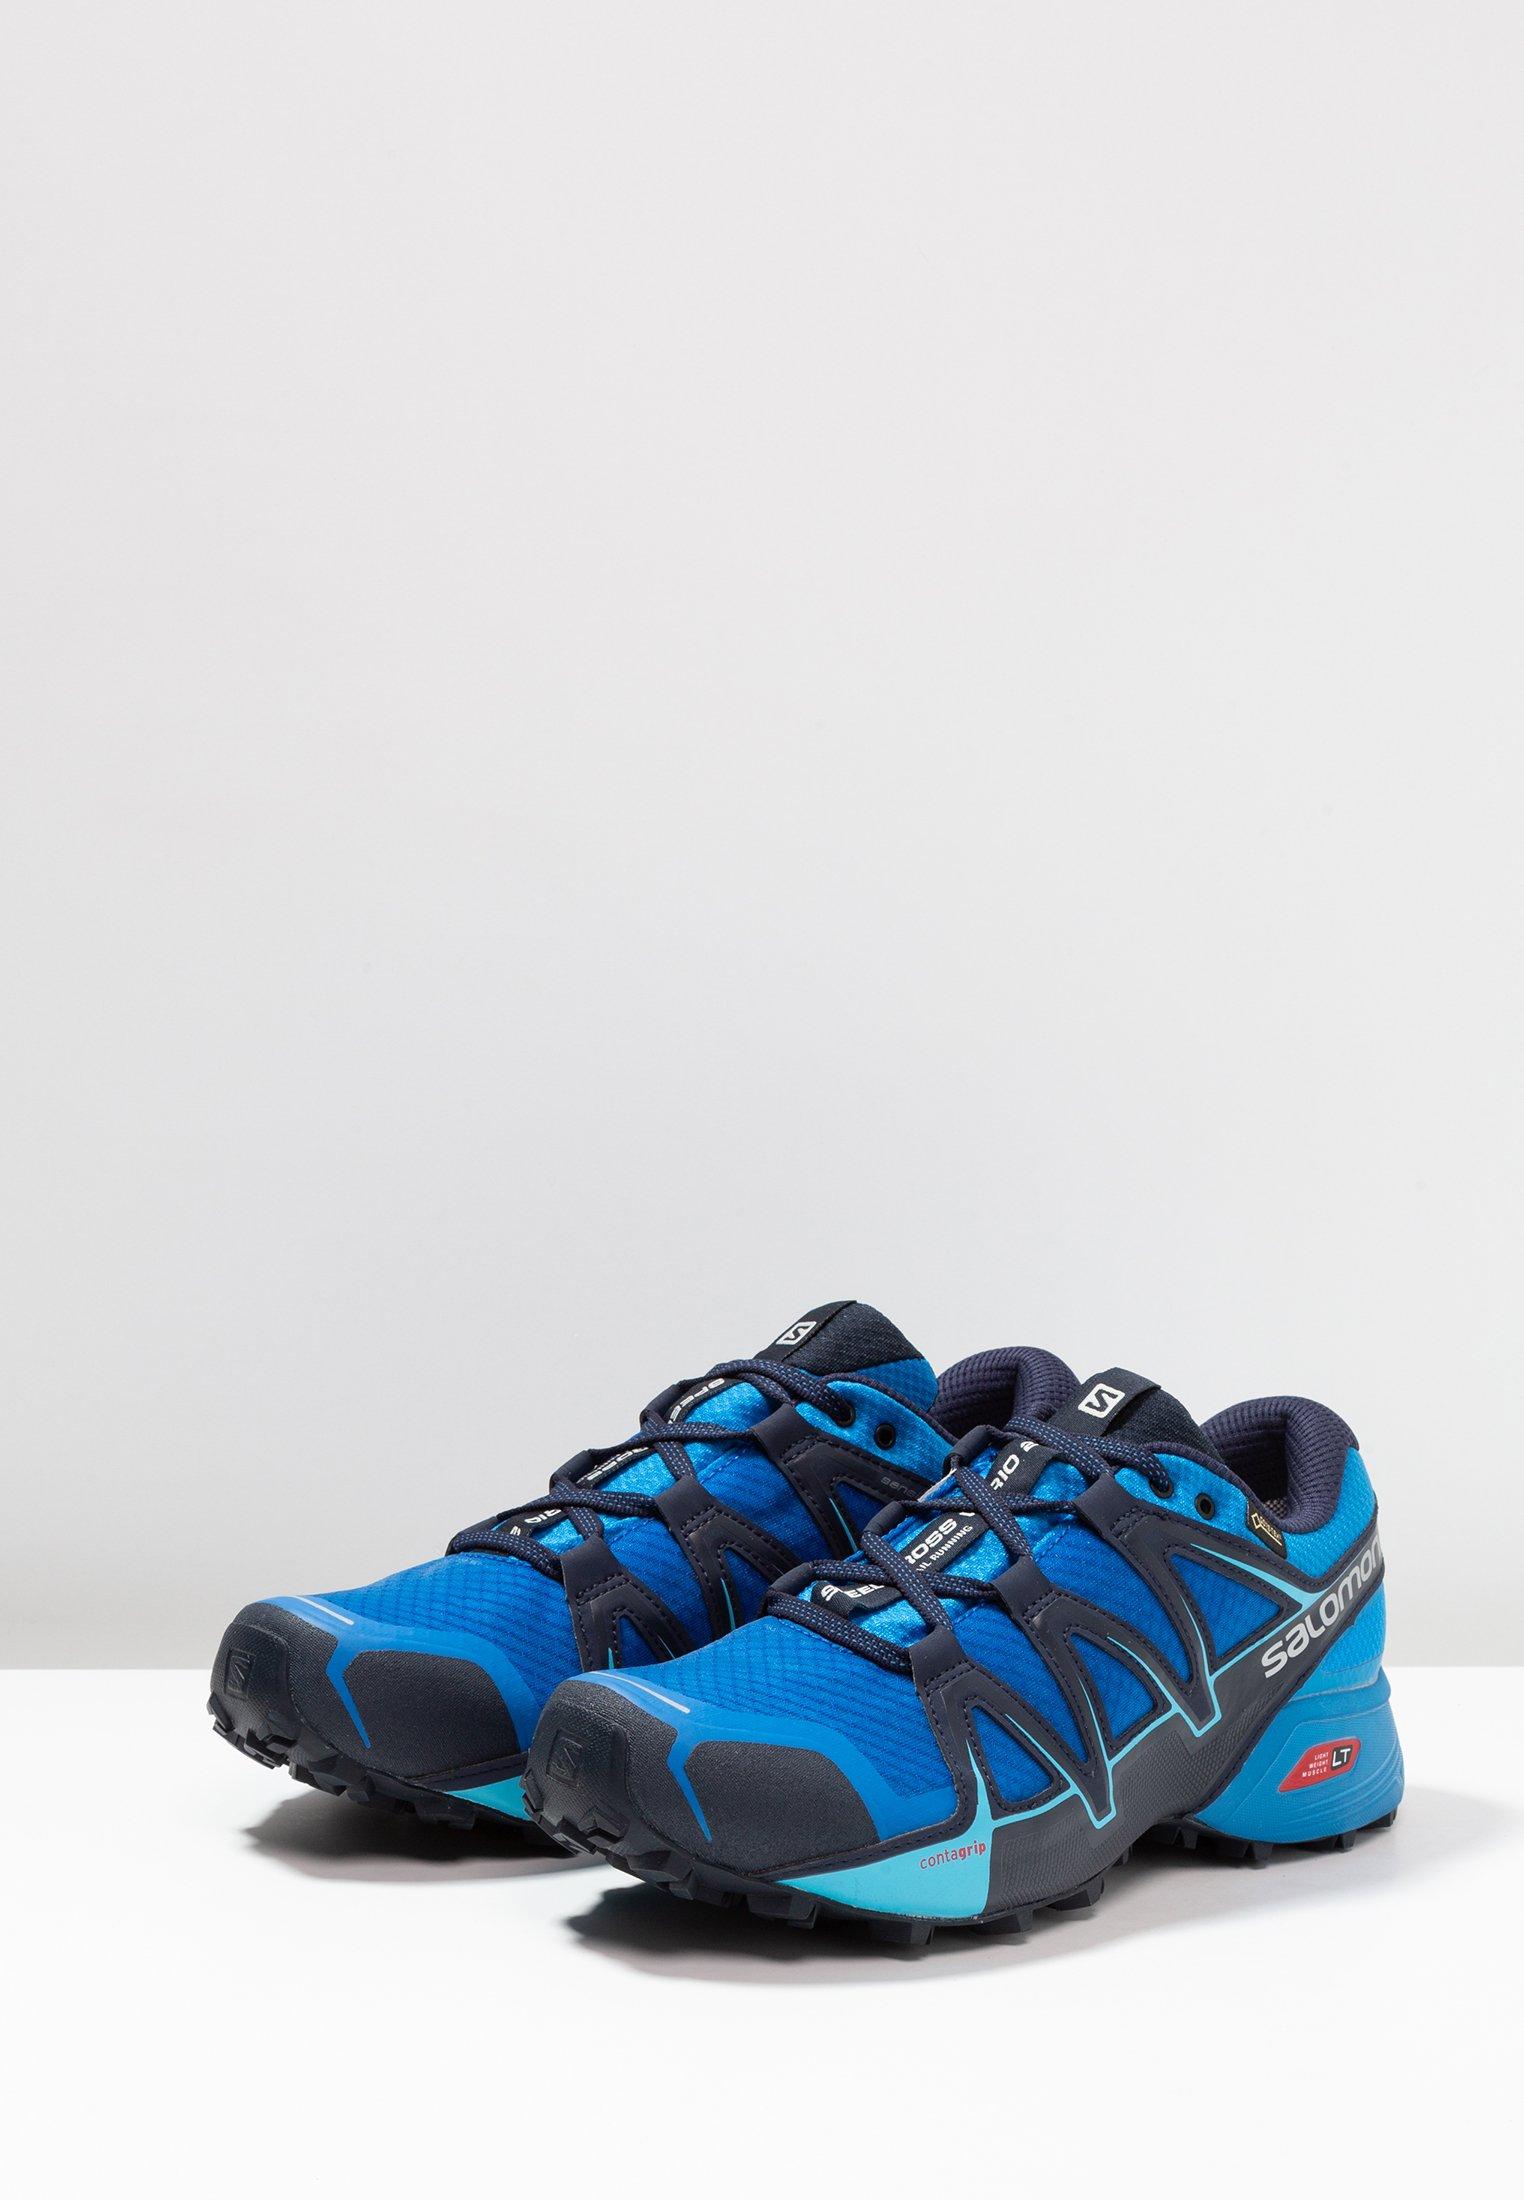 Salomon Mens Speedcross Vario 2 GTX Trail Running Shoes Trainers Sports